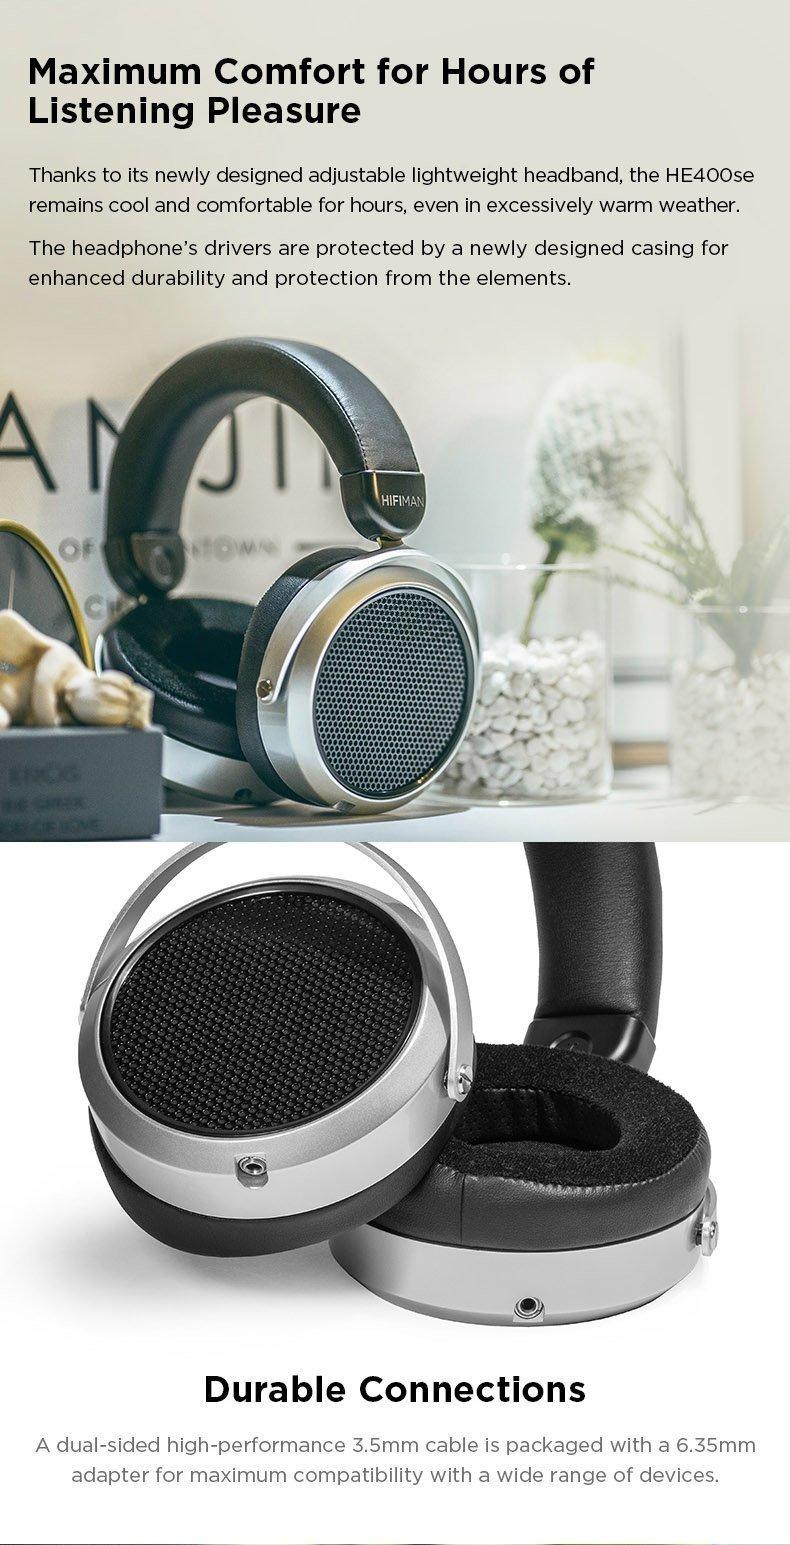 Hifiman headphones he400se description 6